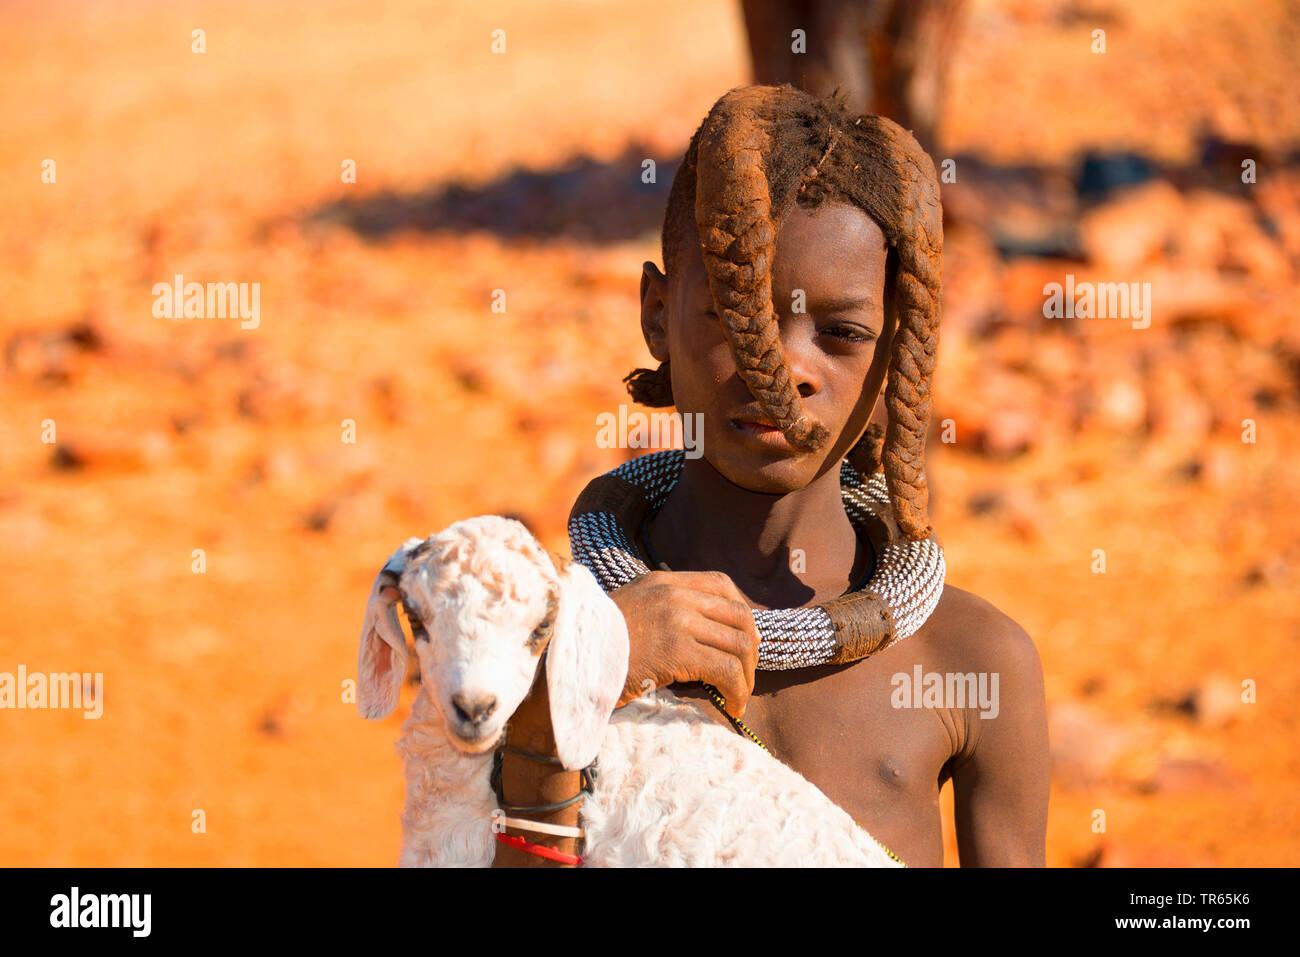 Himbamaedchen traegt Lamm, Namibia | Himba girl carrying a lamb, Namibia | BLWS474285.jpg [ (c) blickwinkel/McPHOTO/F. Scholz Tel. +49 (0)2302-2793220 - Stock Image